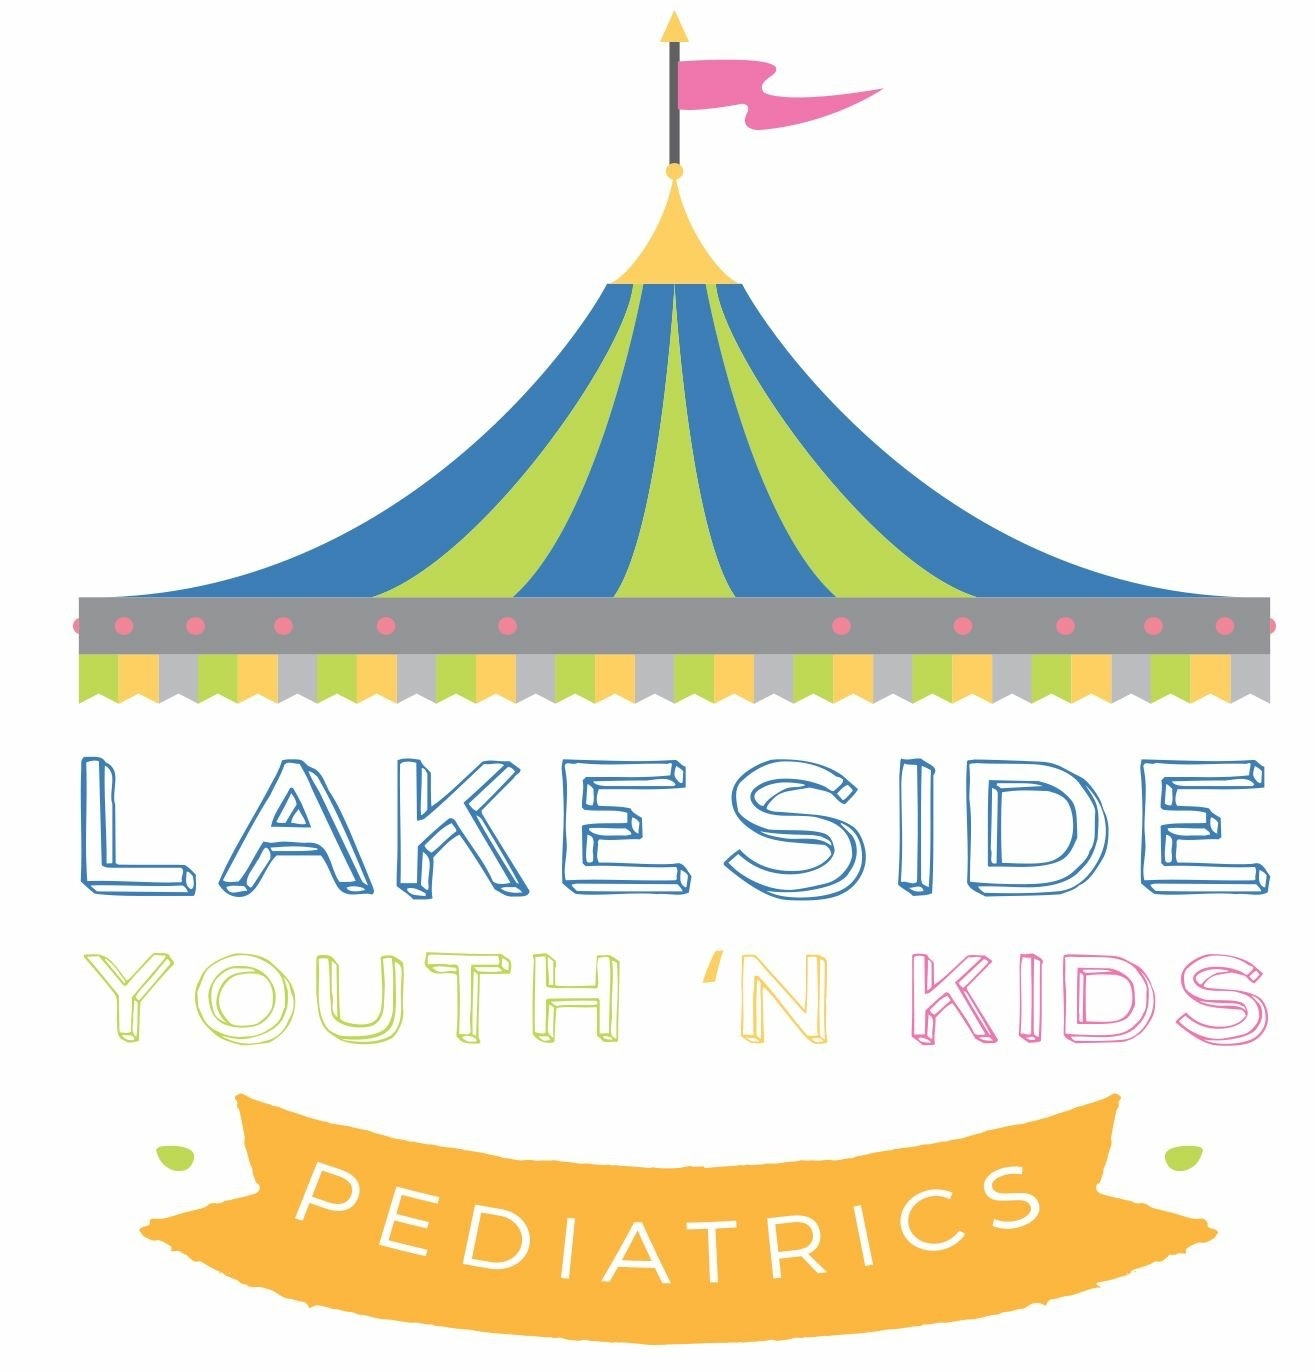 Pediatrician Denver Pediatrics Denver Wheat Ridge - LYNK Pediatrics Lance Lazatin Logo